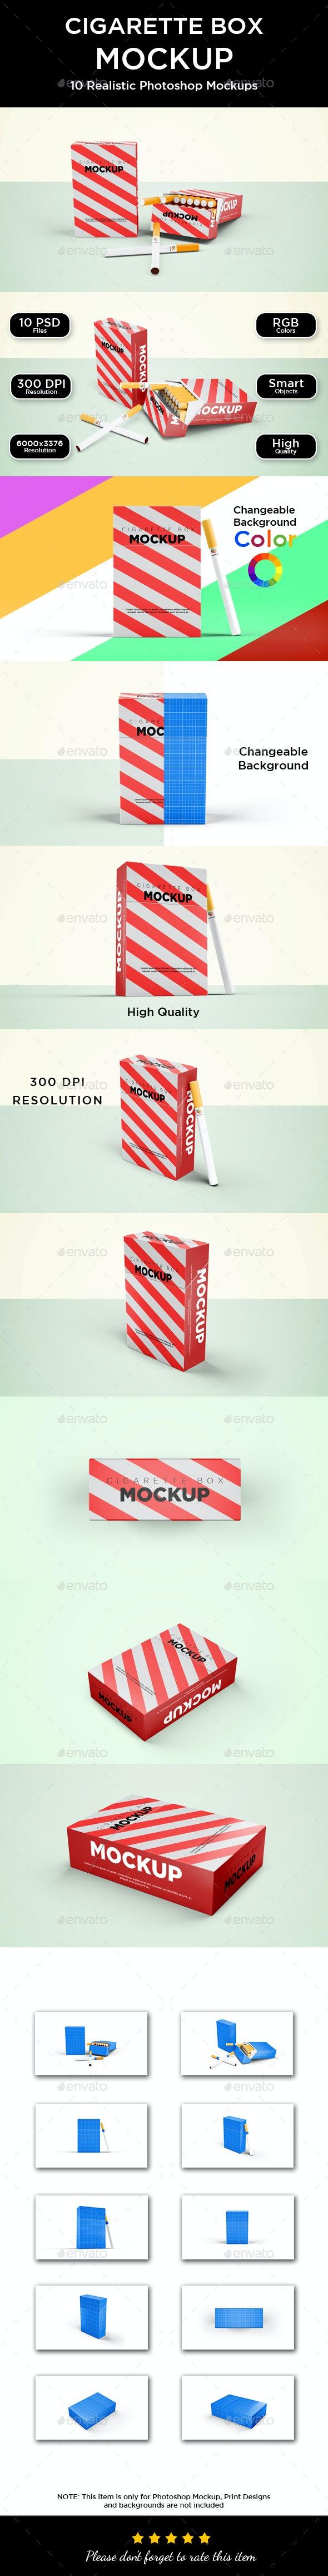 Cigarette Box Mockup - Packaging Product Mock-Ups